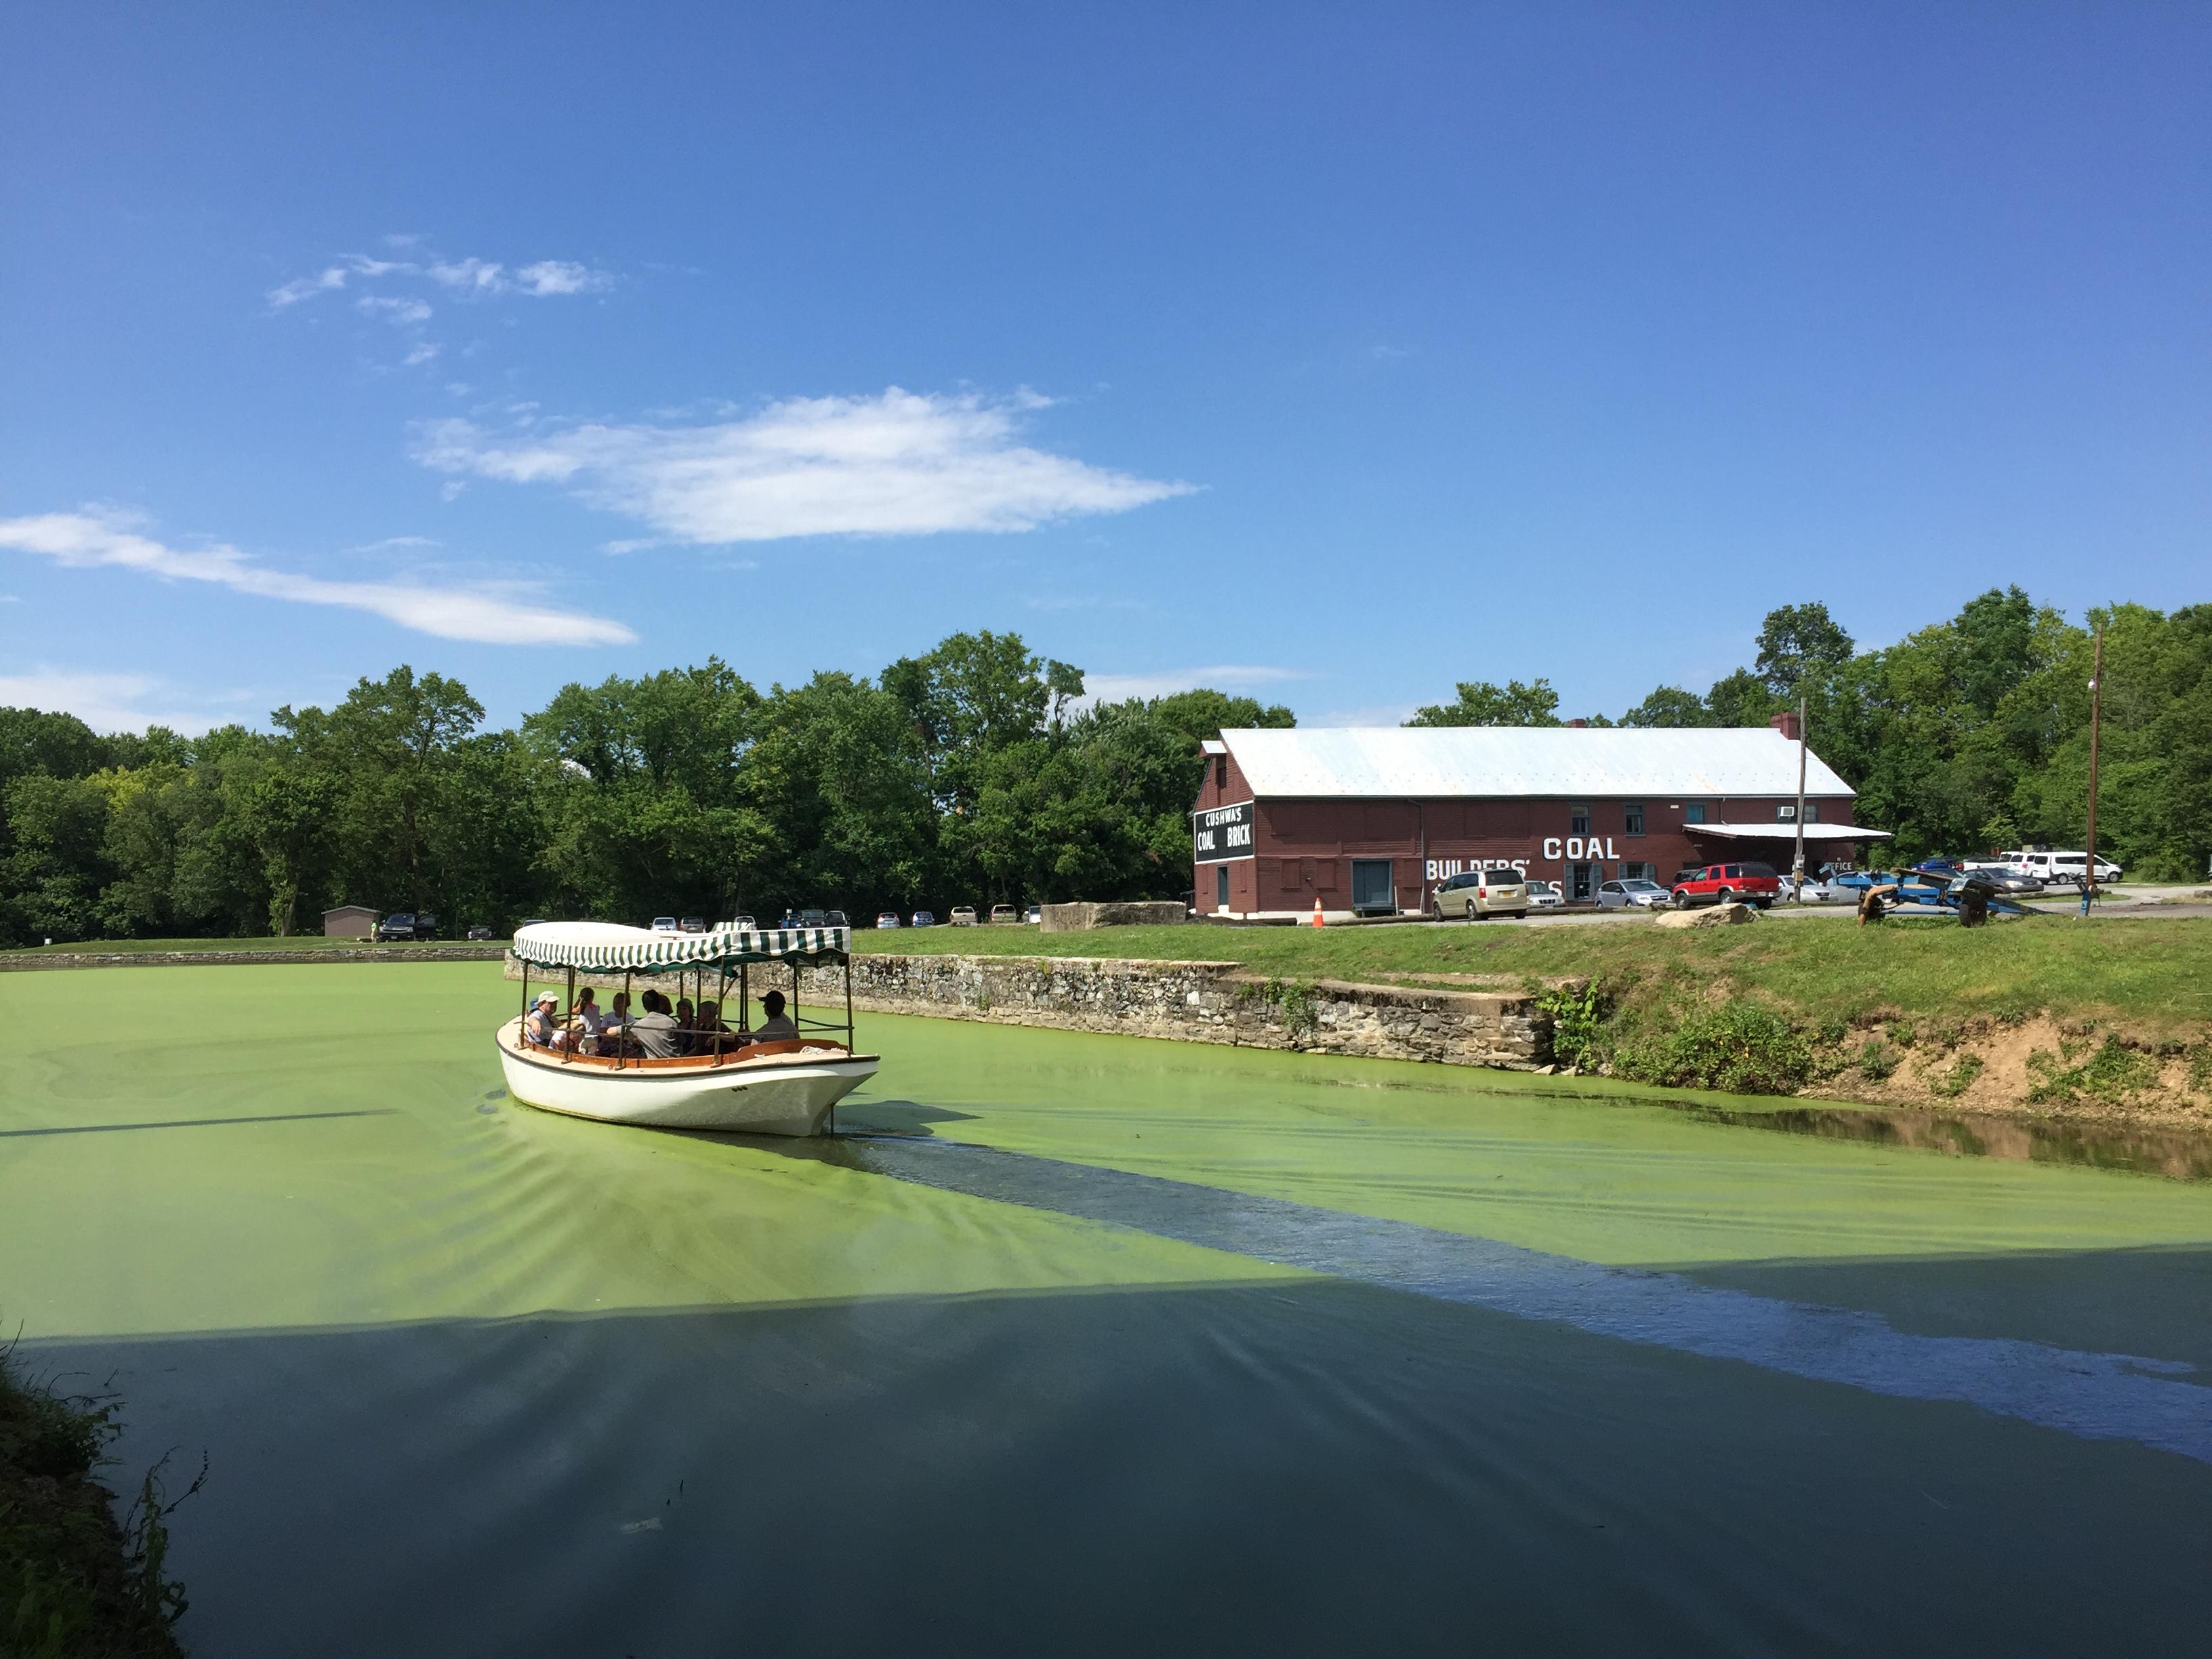 Williamsport Boat Ride